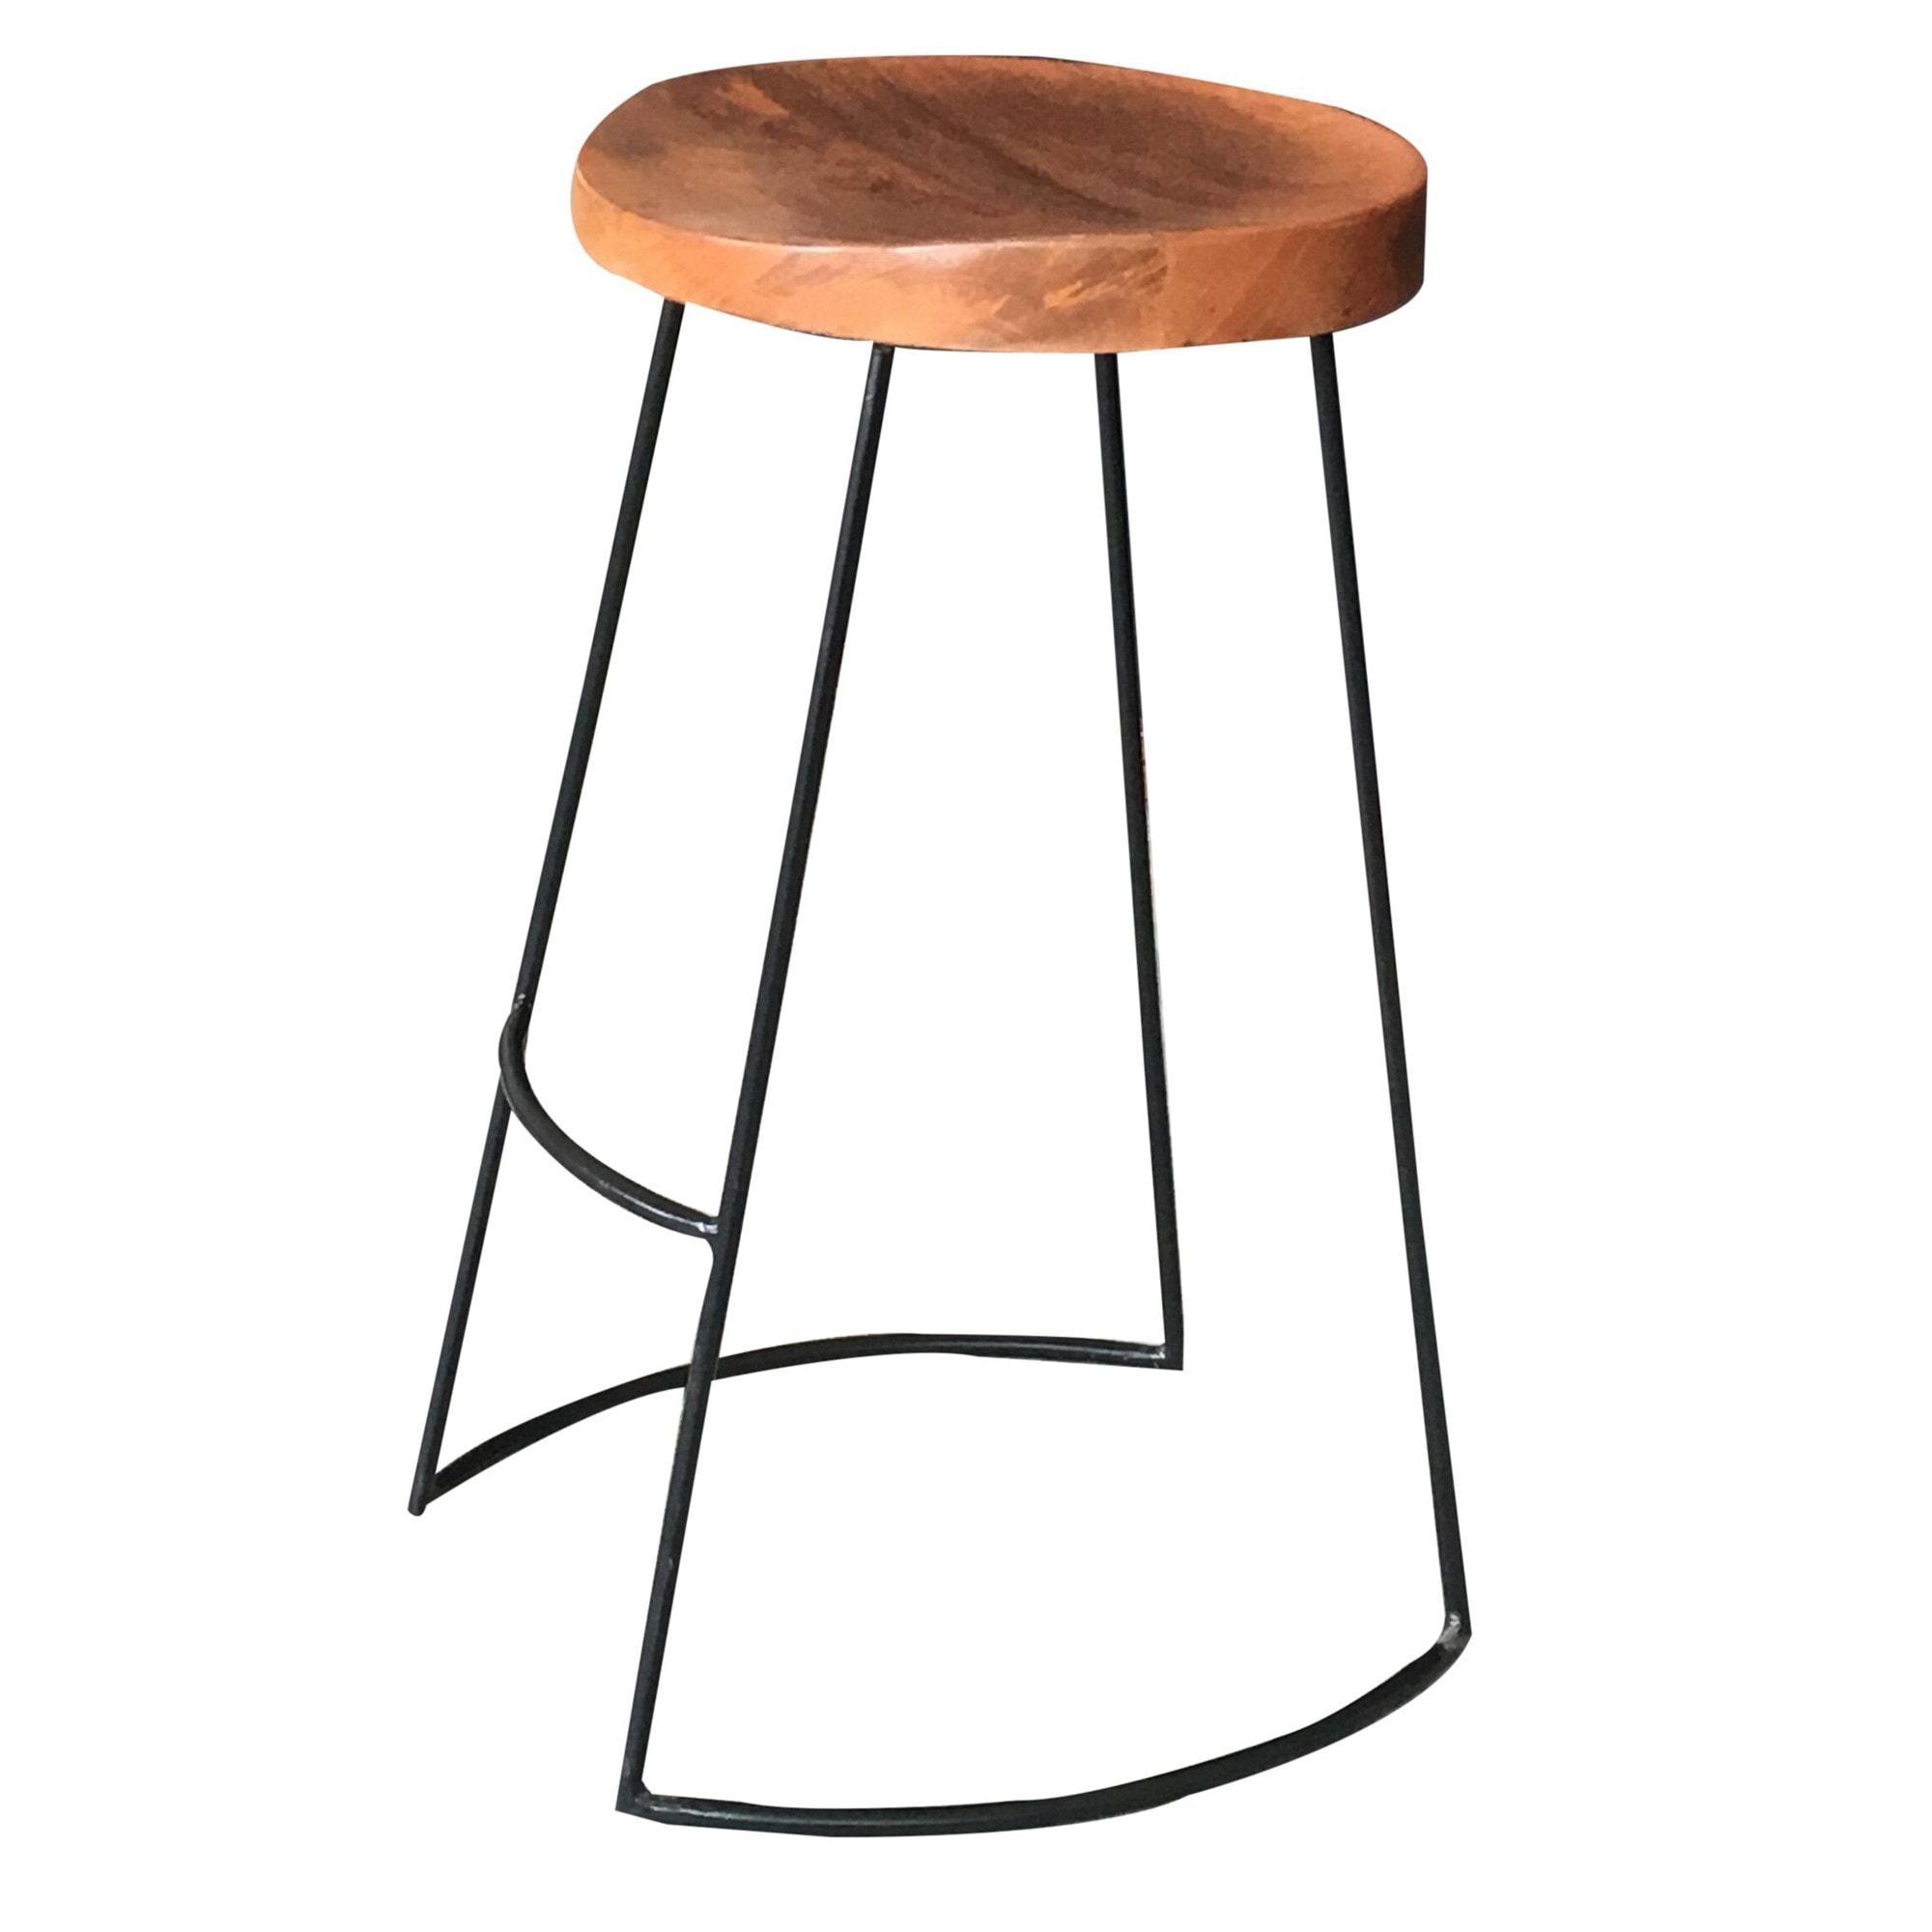 Image of: Wooden Top Stand Bar Stool Bar Stools Wooden Bar Stools